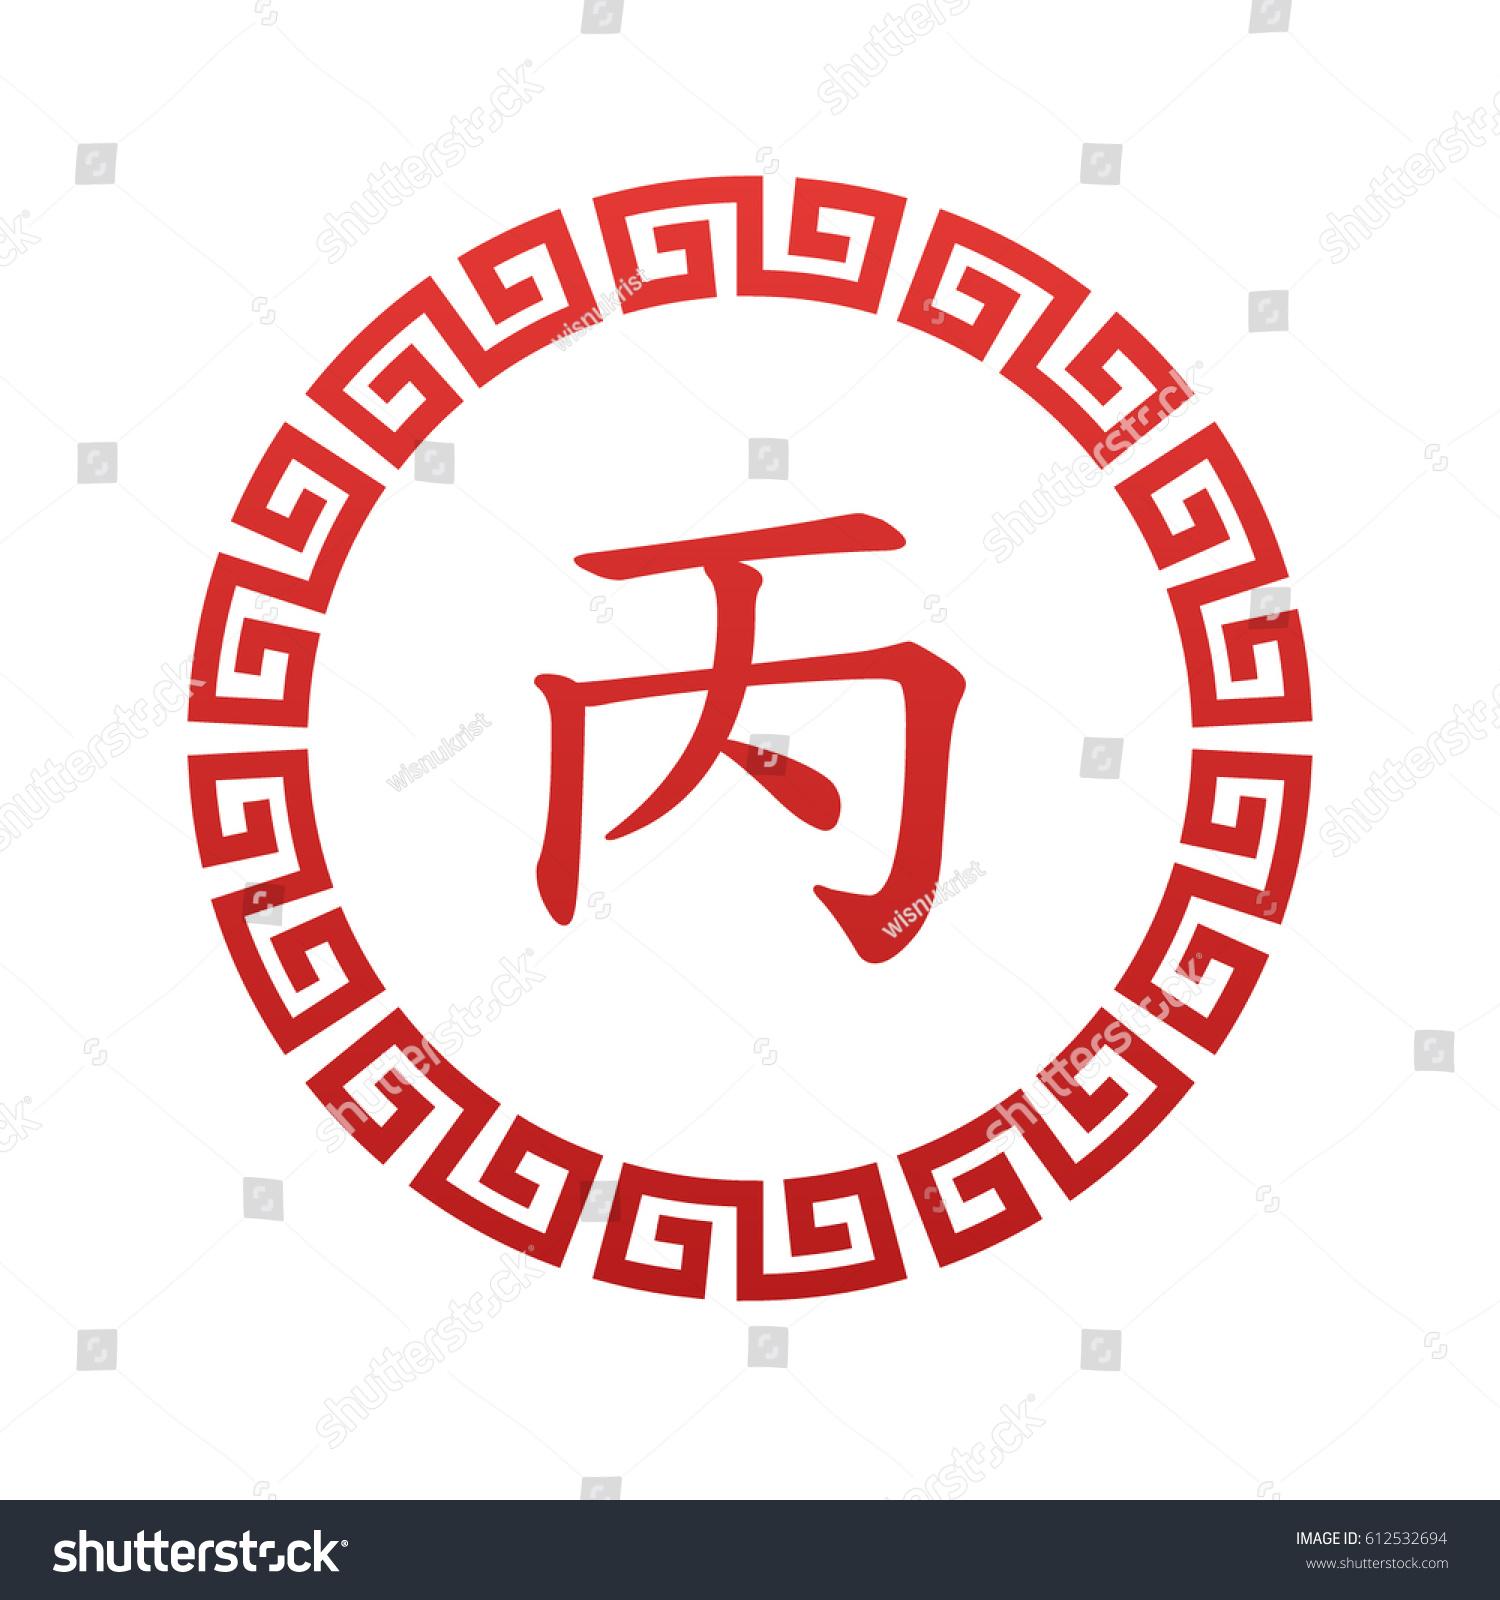 Bing yang fire 10 element symbol stock vector 612532694 shutterstock bing yang fire 10 element symbol with chinese border buycottarizona Images